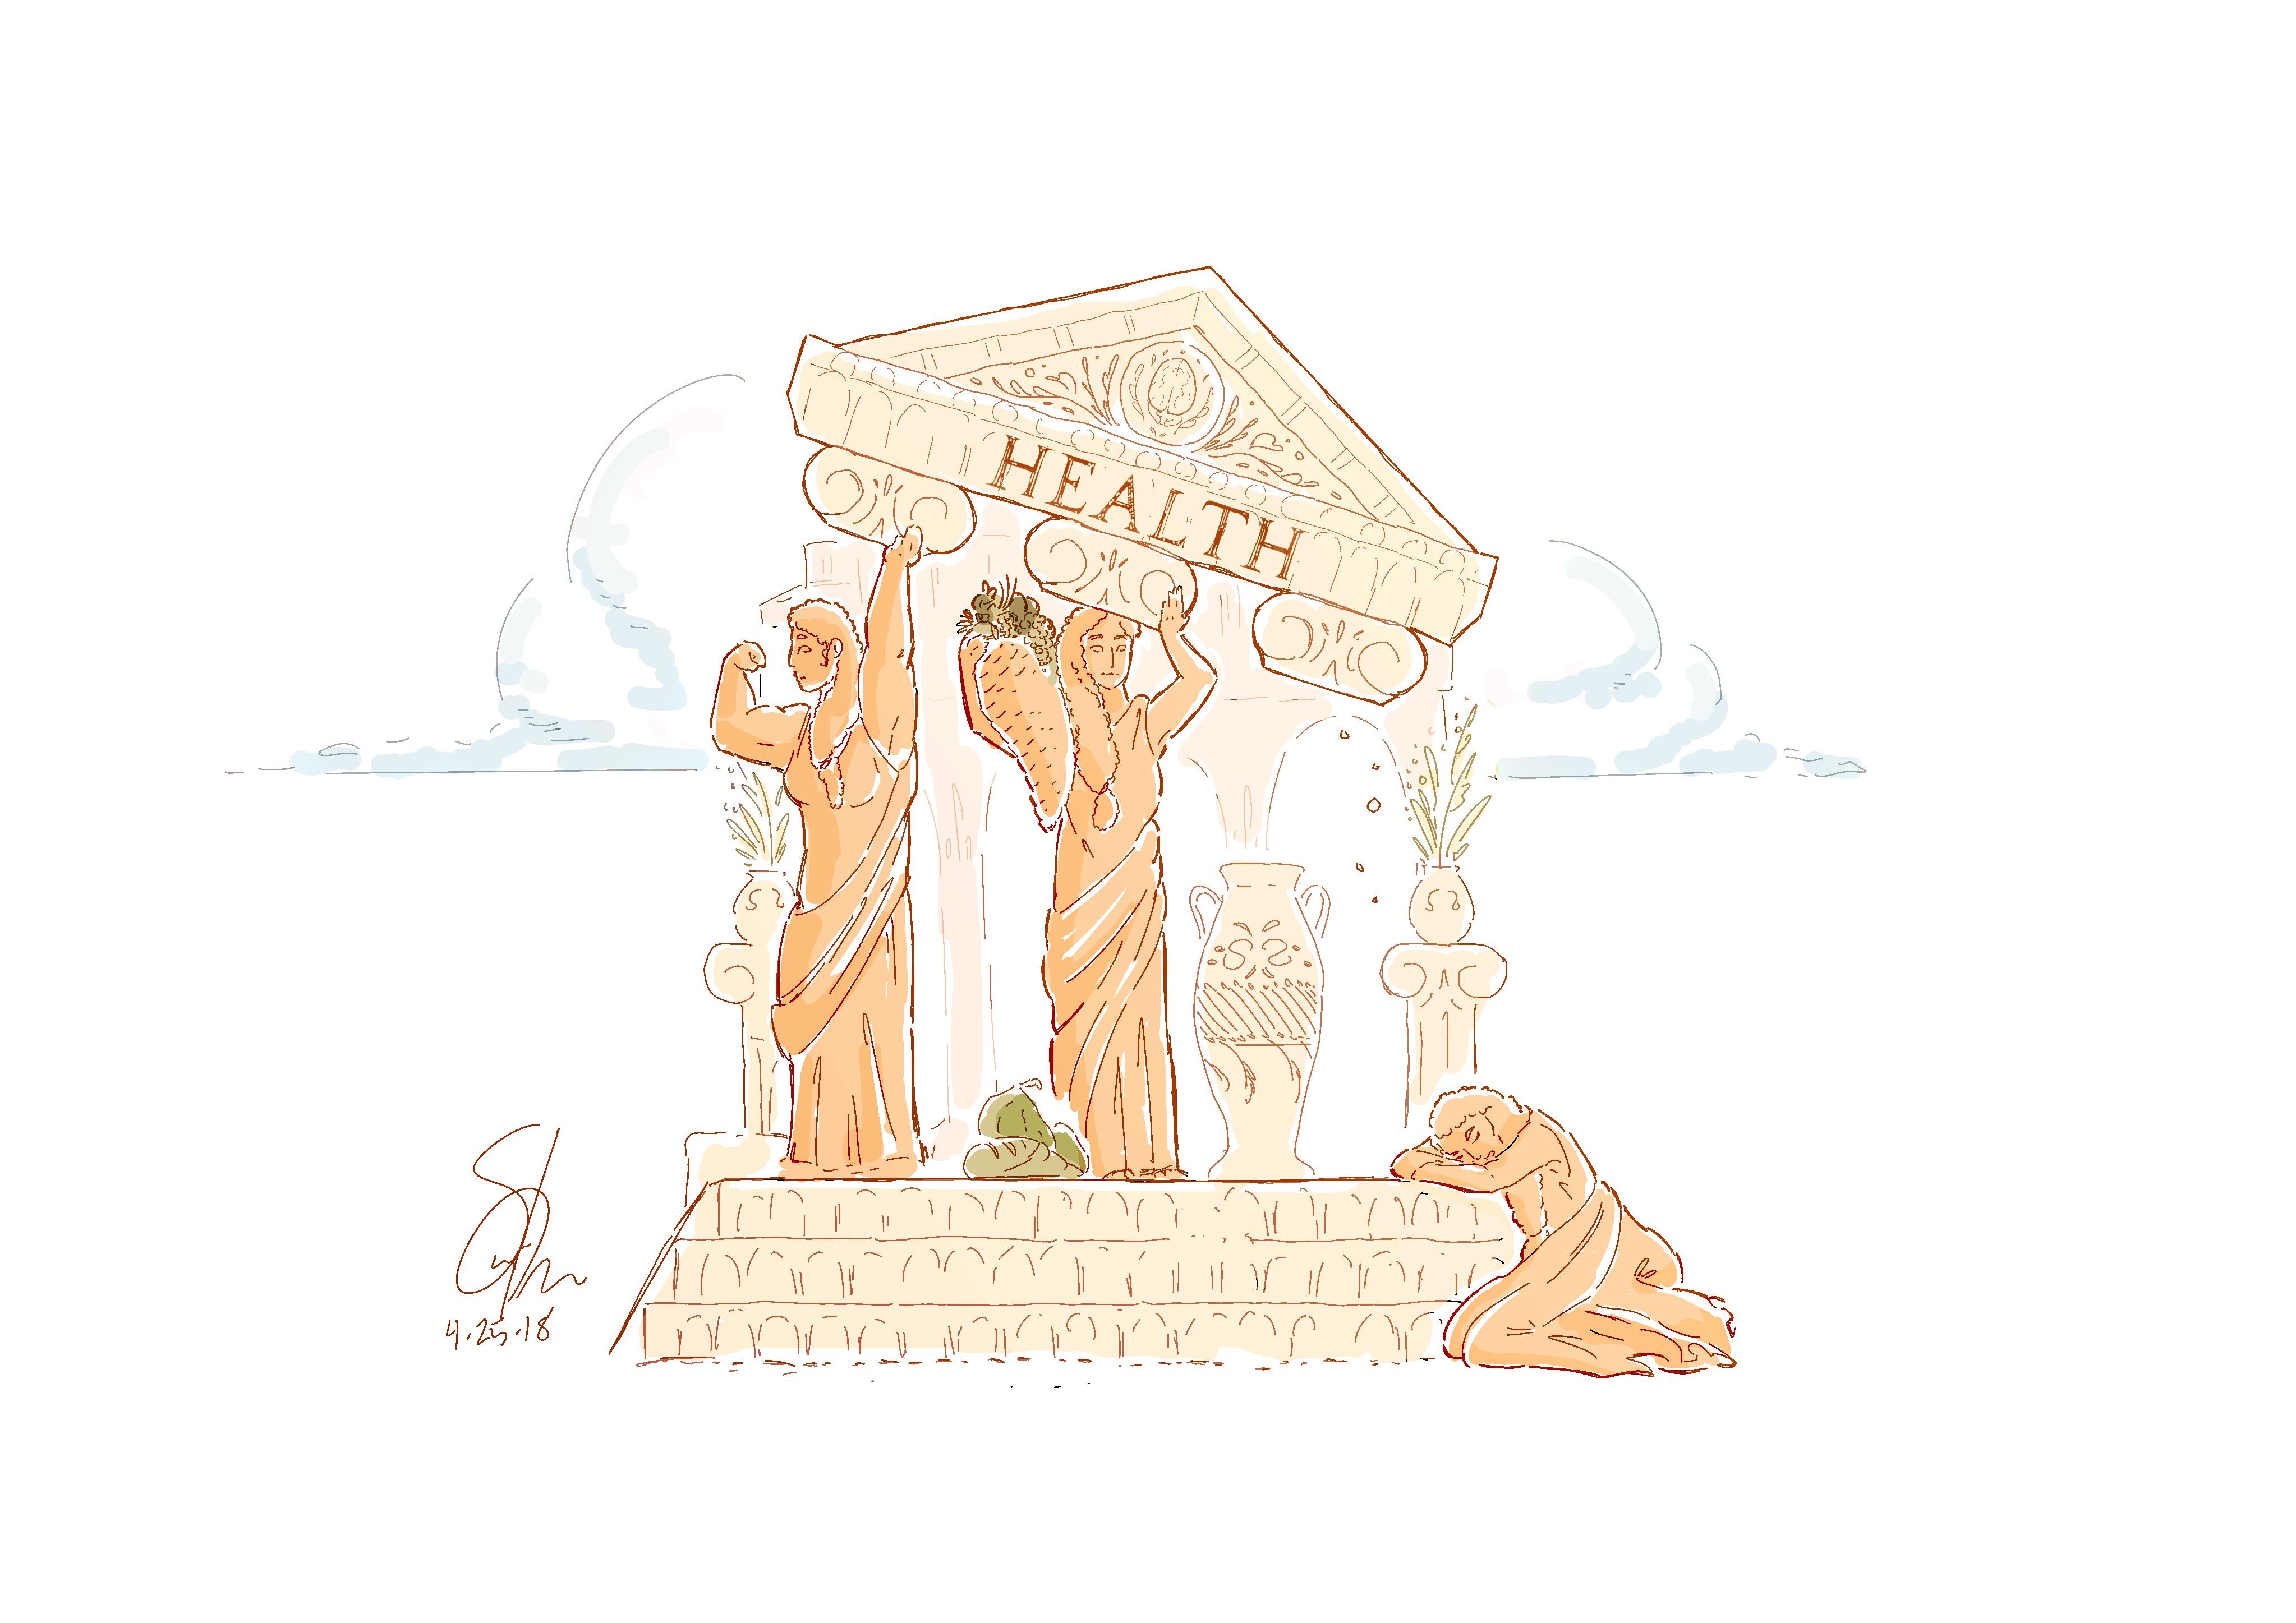 Pillars of Health